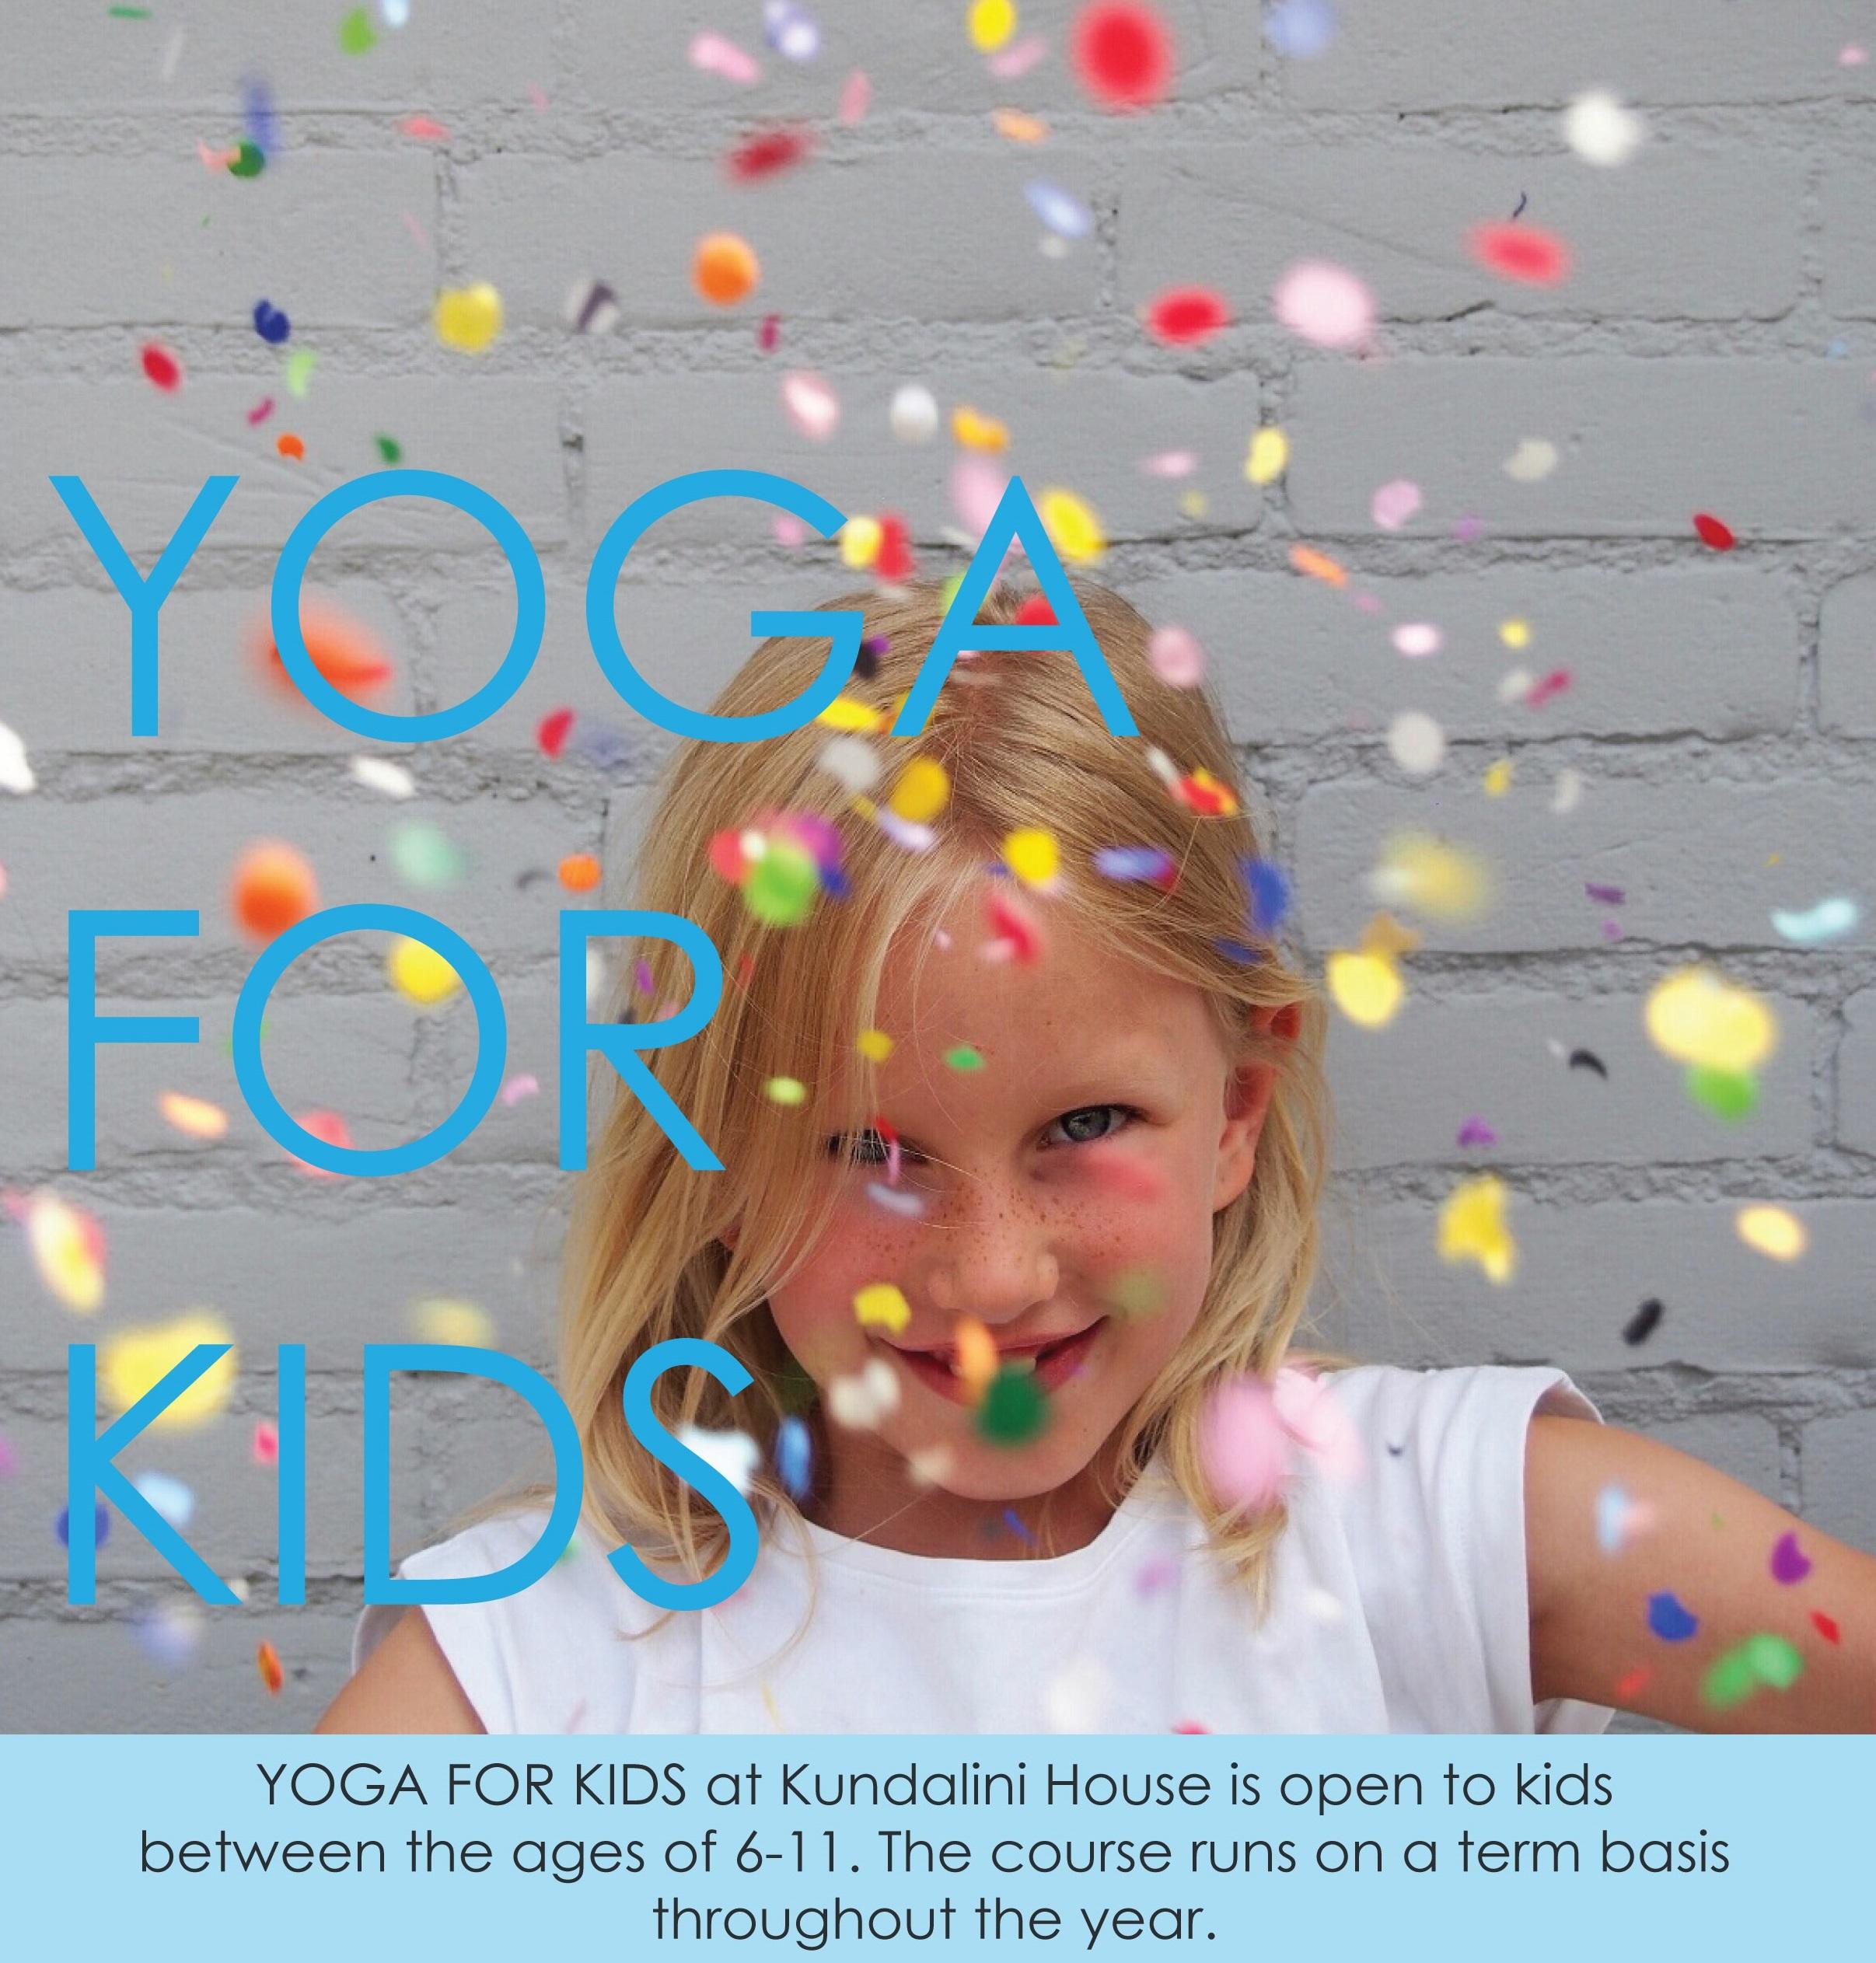 Kids Yoga Course Kundalini House Fitzroy north